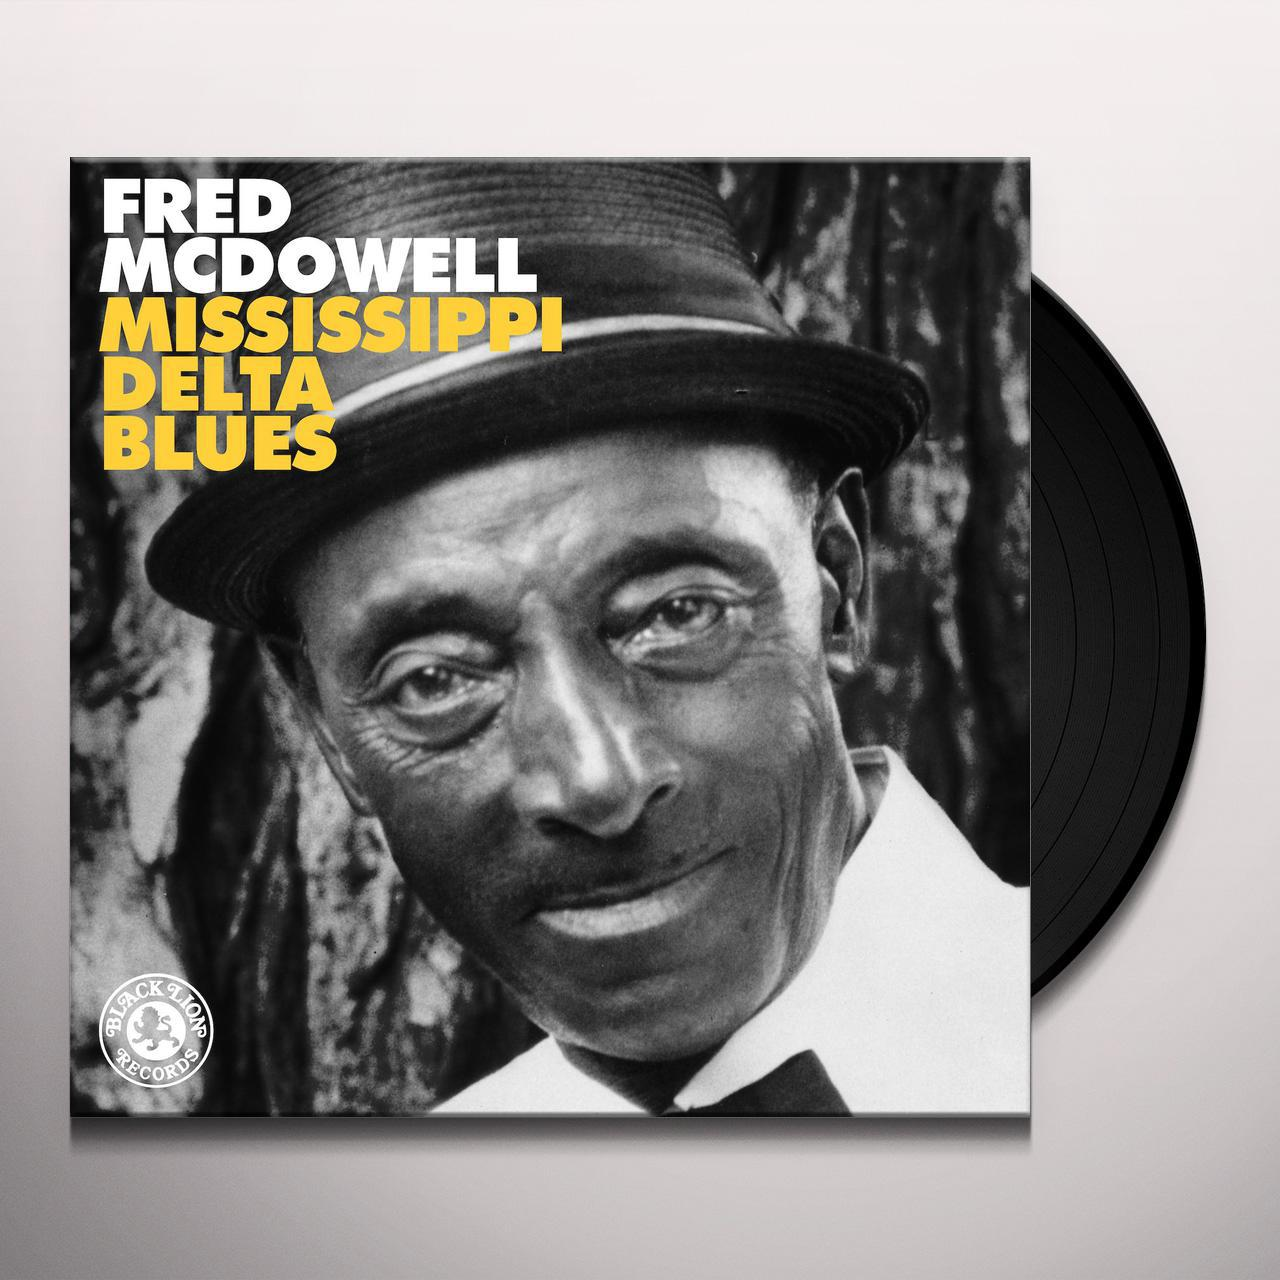 Fred McDowell, Mississippi Delta Blues, Org Music.jpg